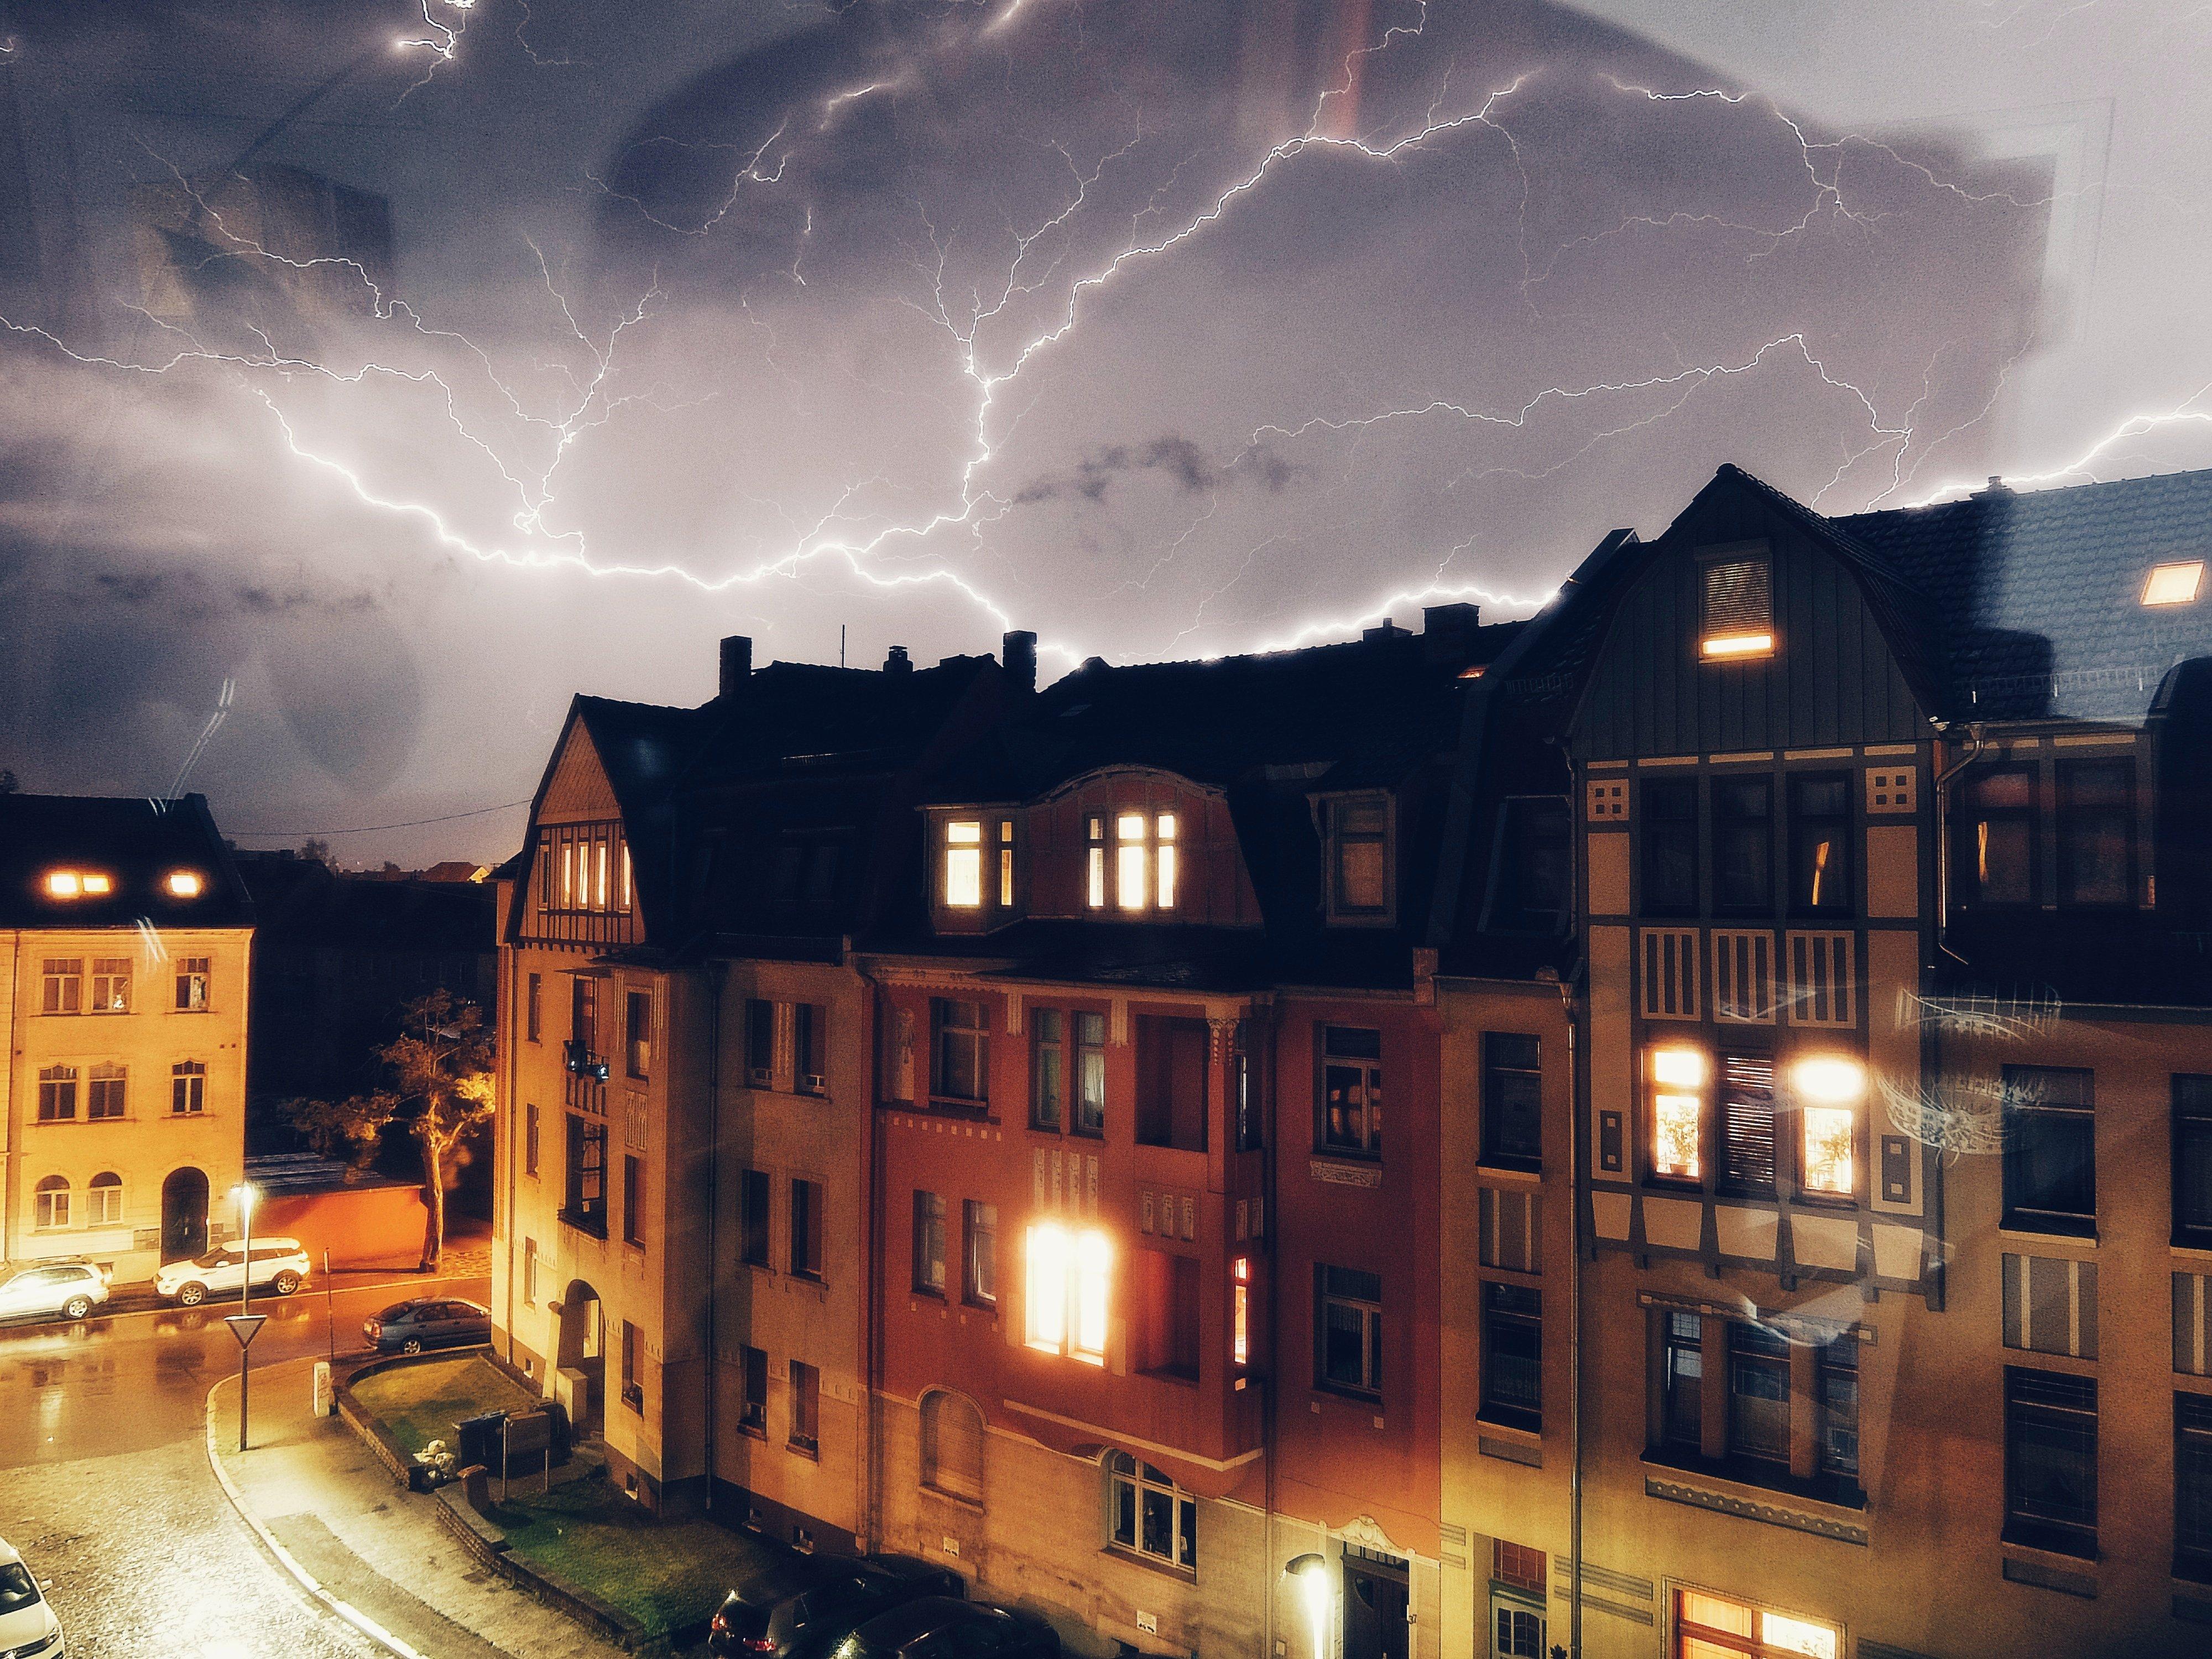 thunder-baby-41604294882